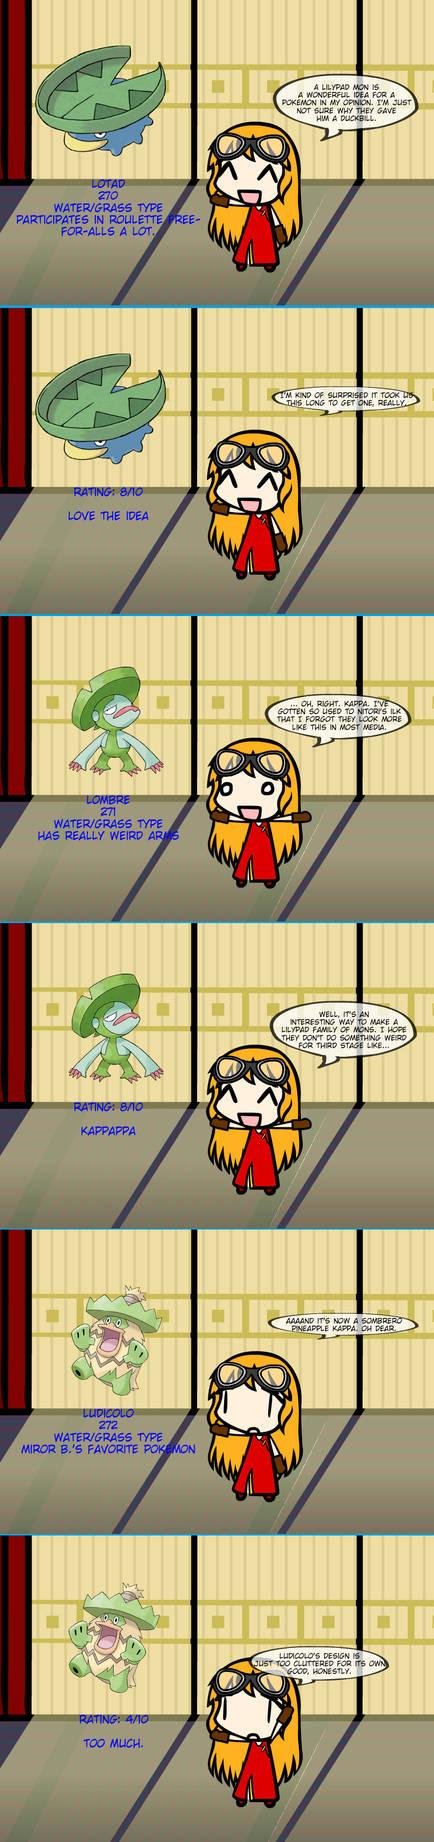 Lilina Reviews Pokemon Families 132